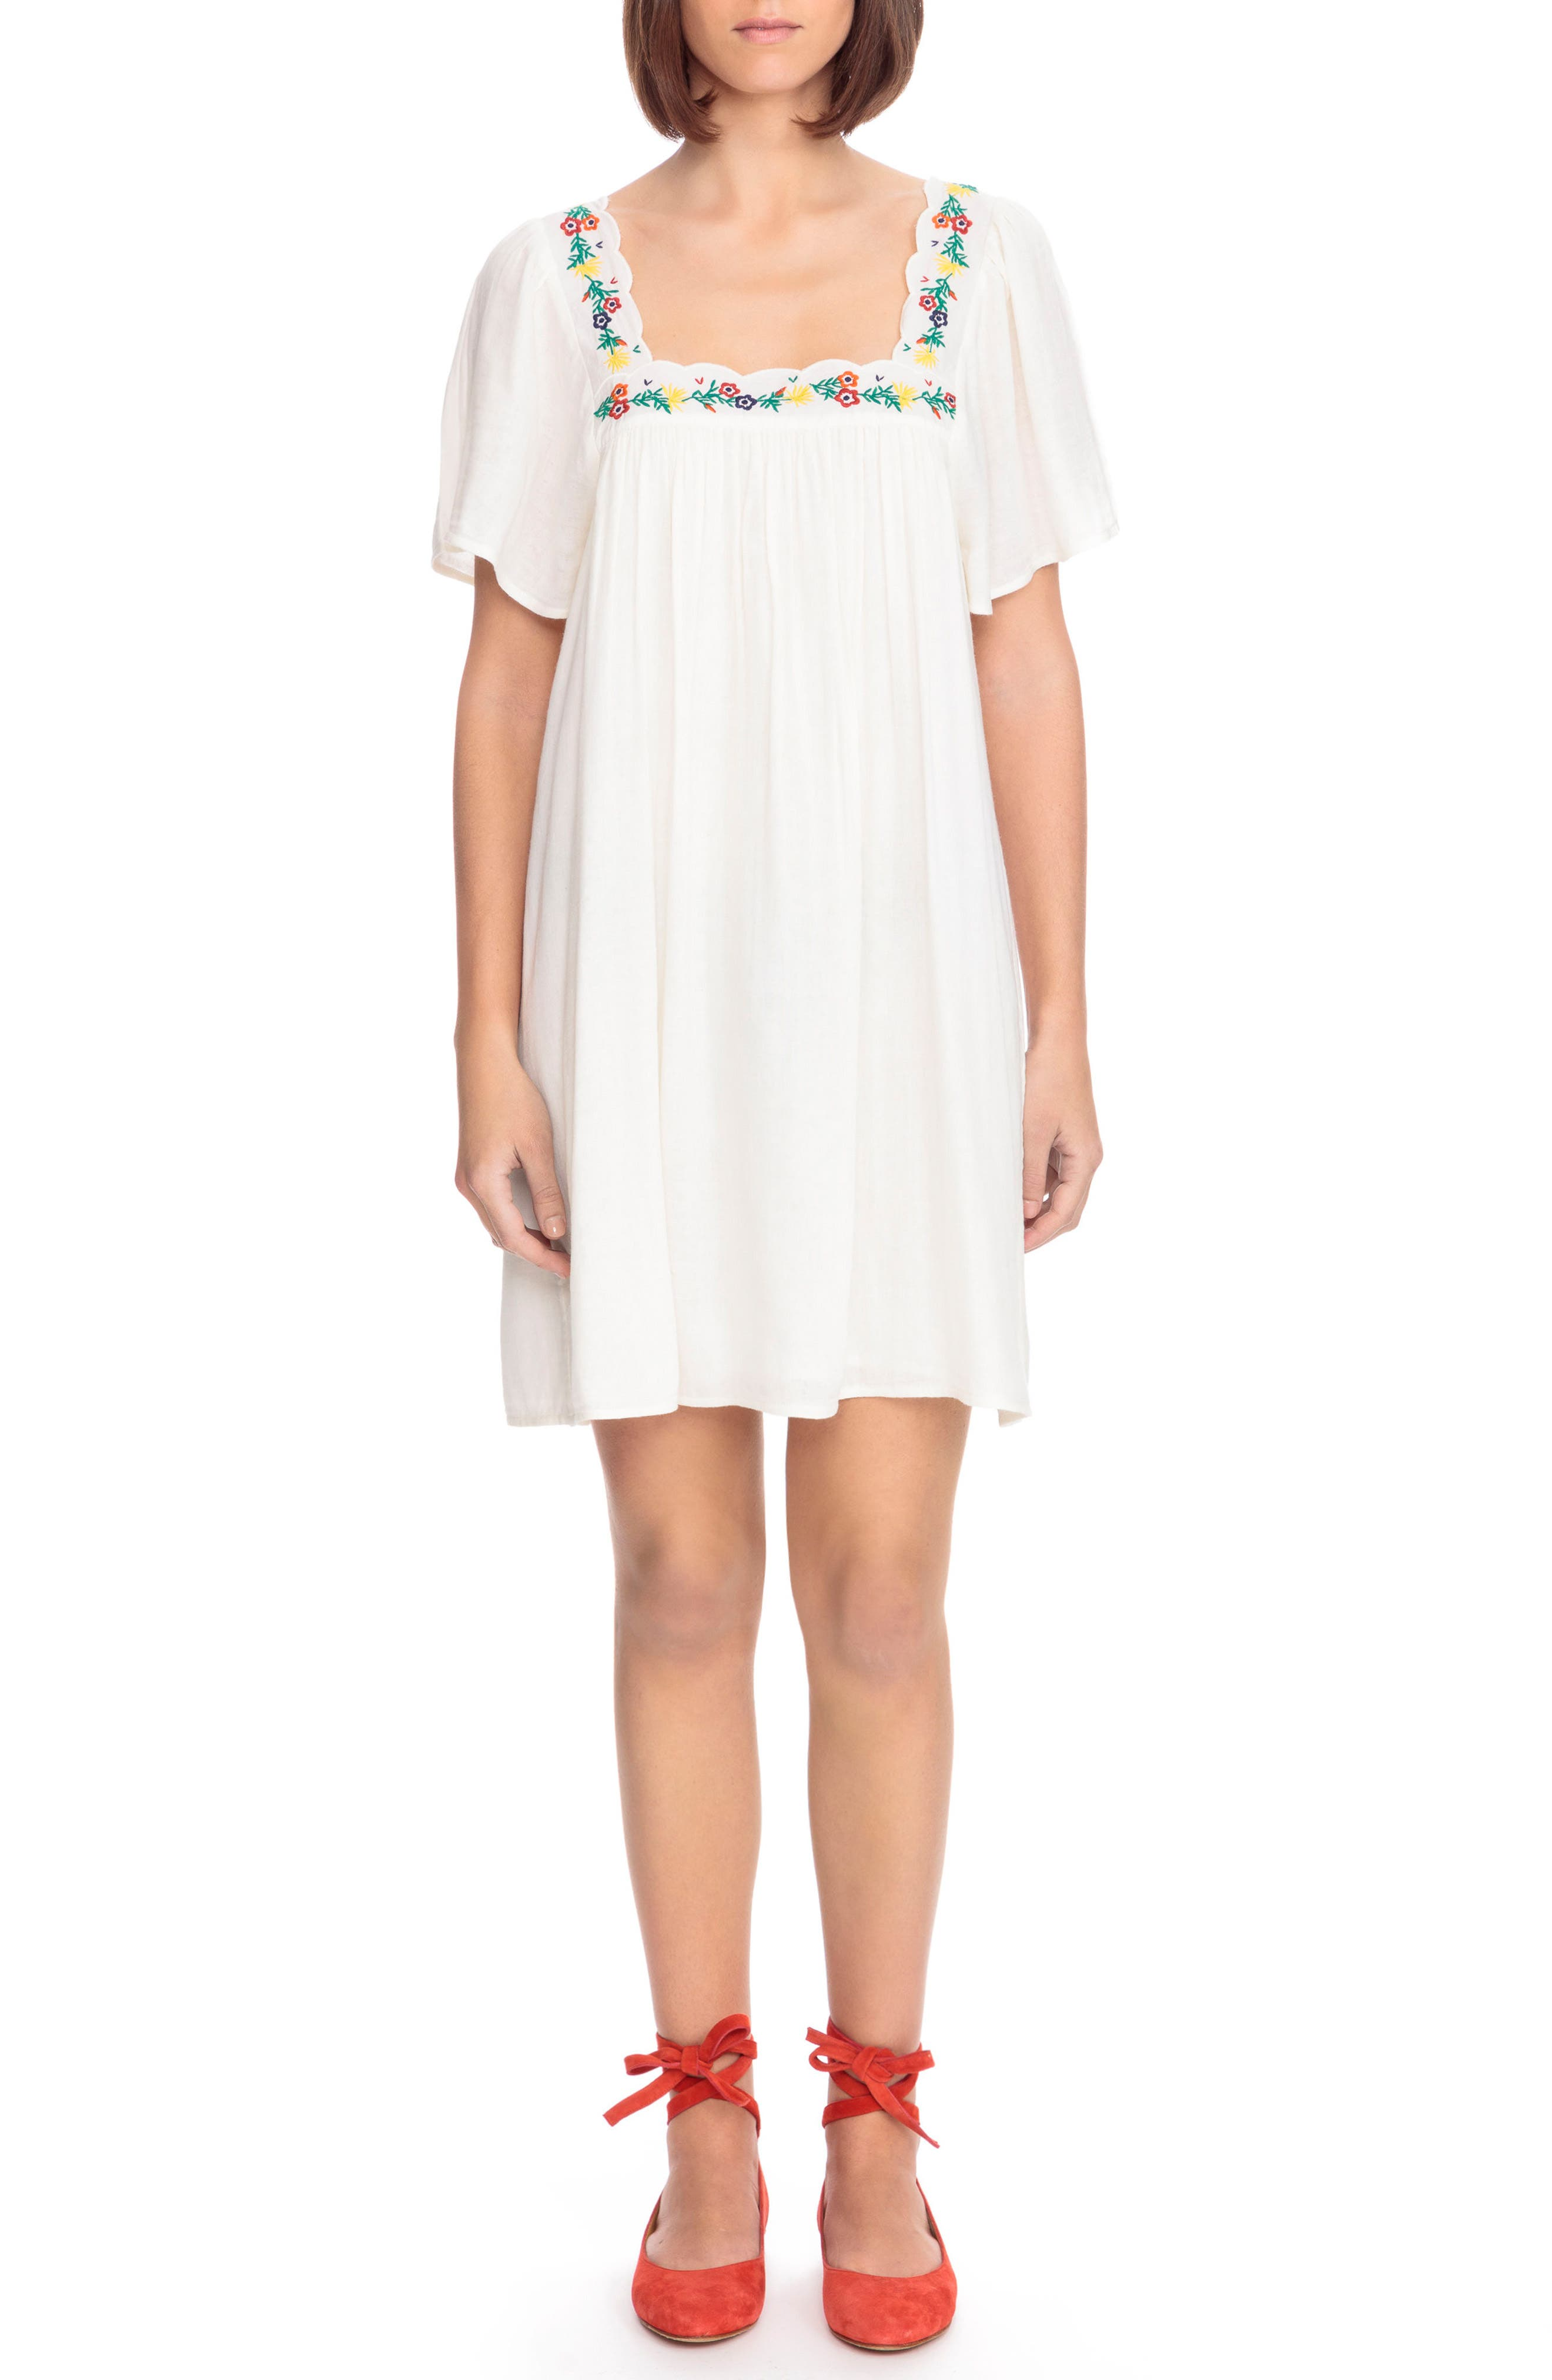 Sézane Caitlin Embroidered Shift Dress